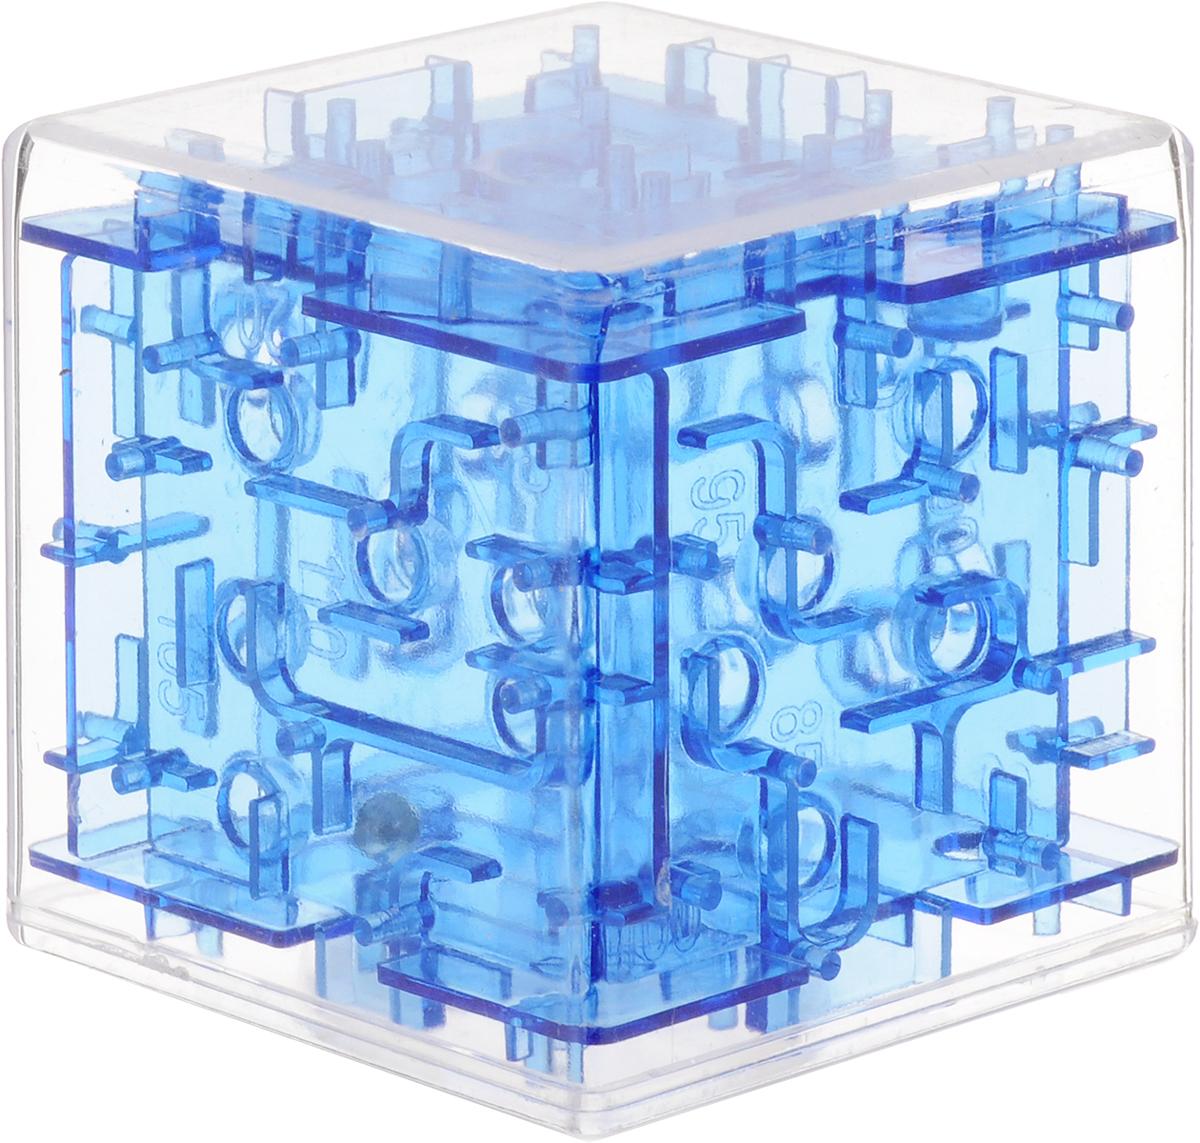 Эврика Головоломка-лабиринт Куб цвет синий головоломка эврика лабиринт сфера red 98723